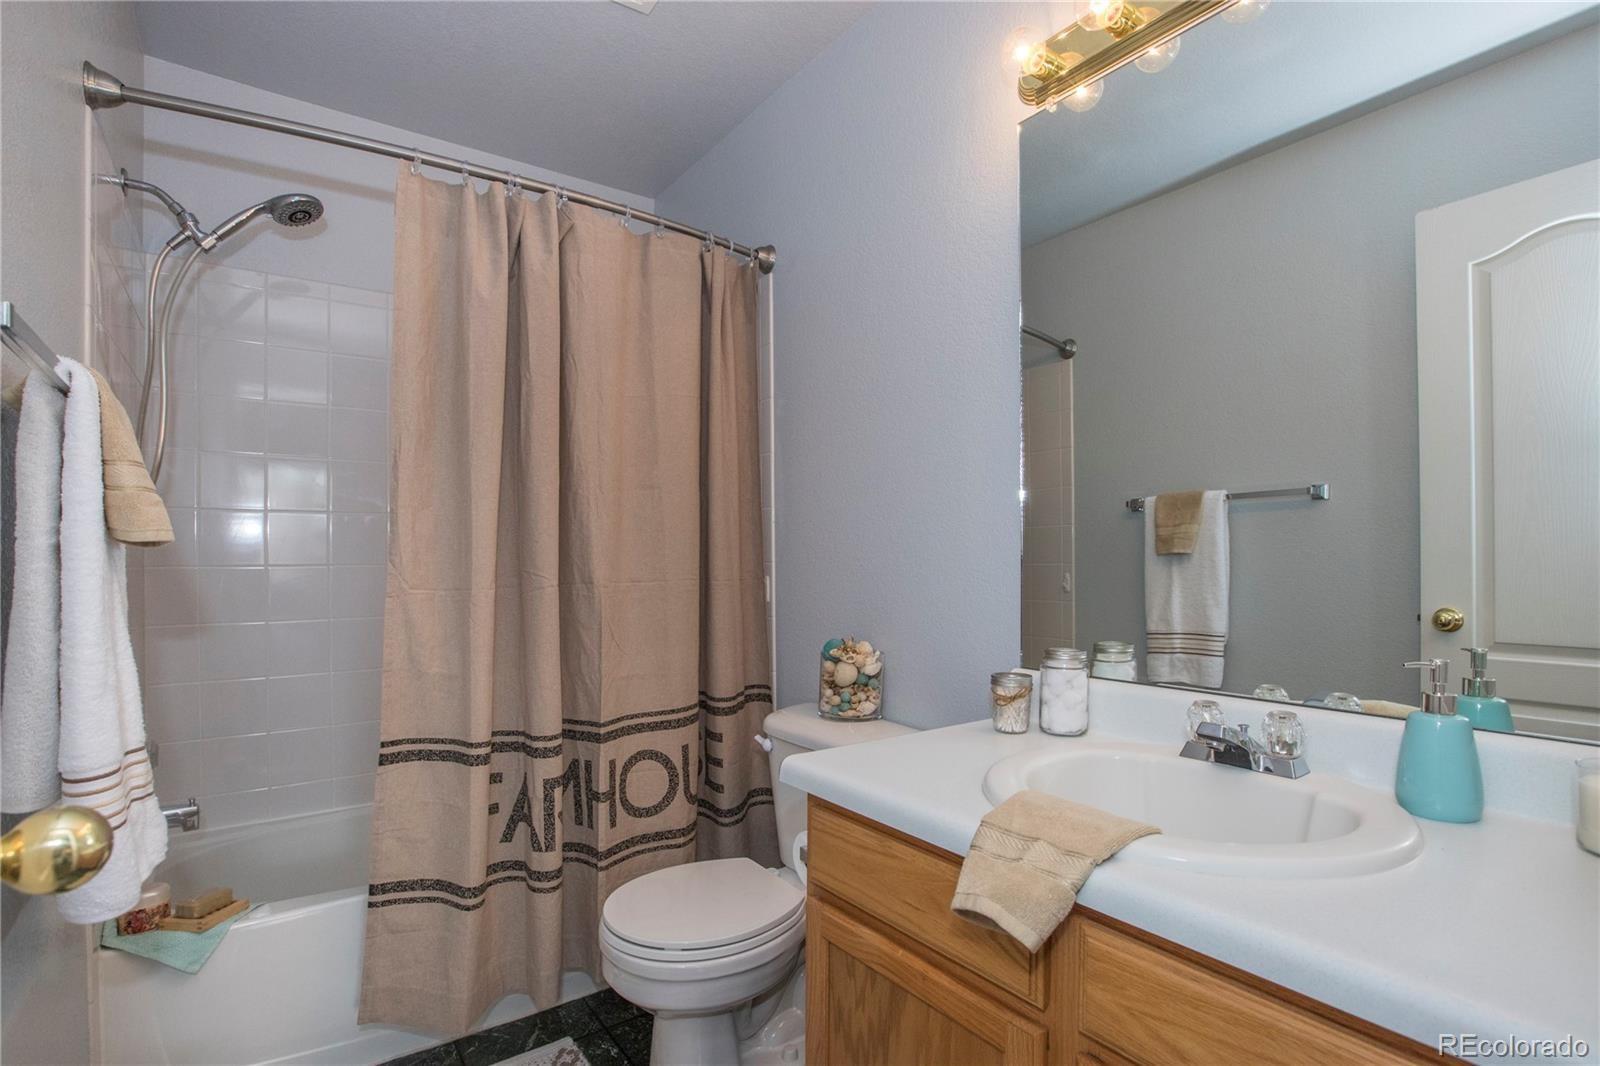 MLS# 3758449 - 21 - 6802 Antigua Drive #26, Fort Collins, CO 80525